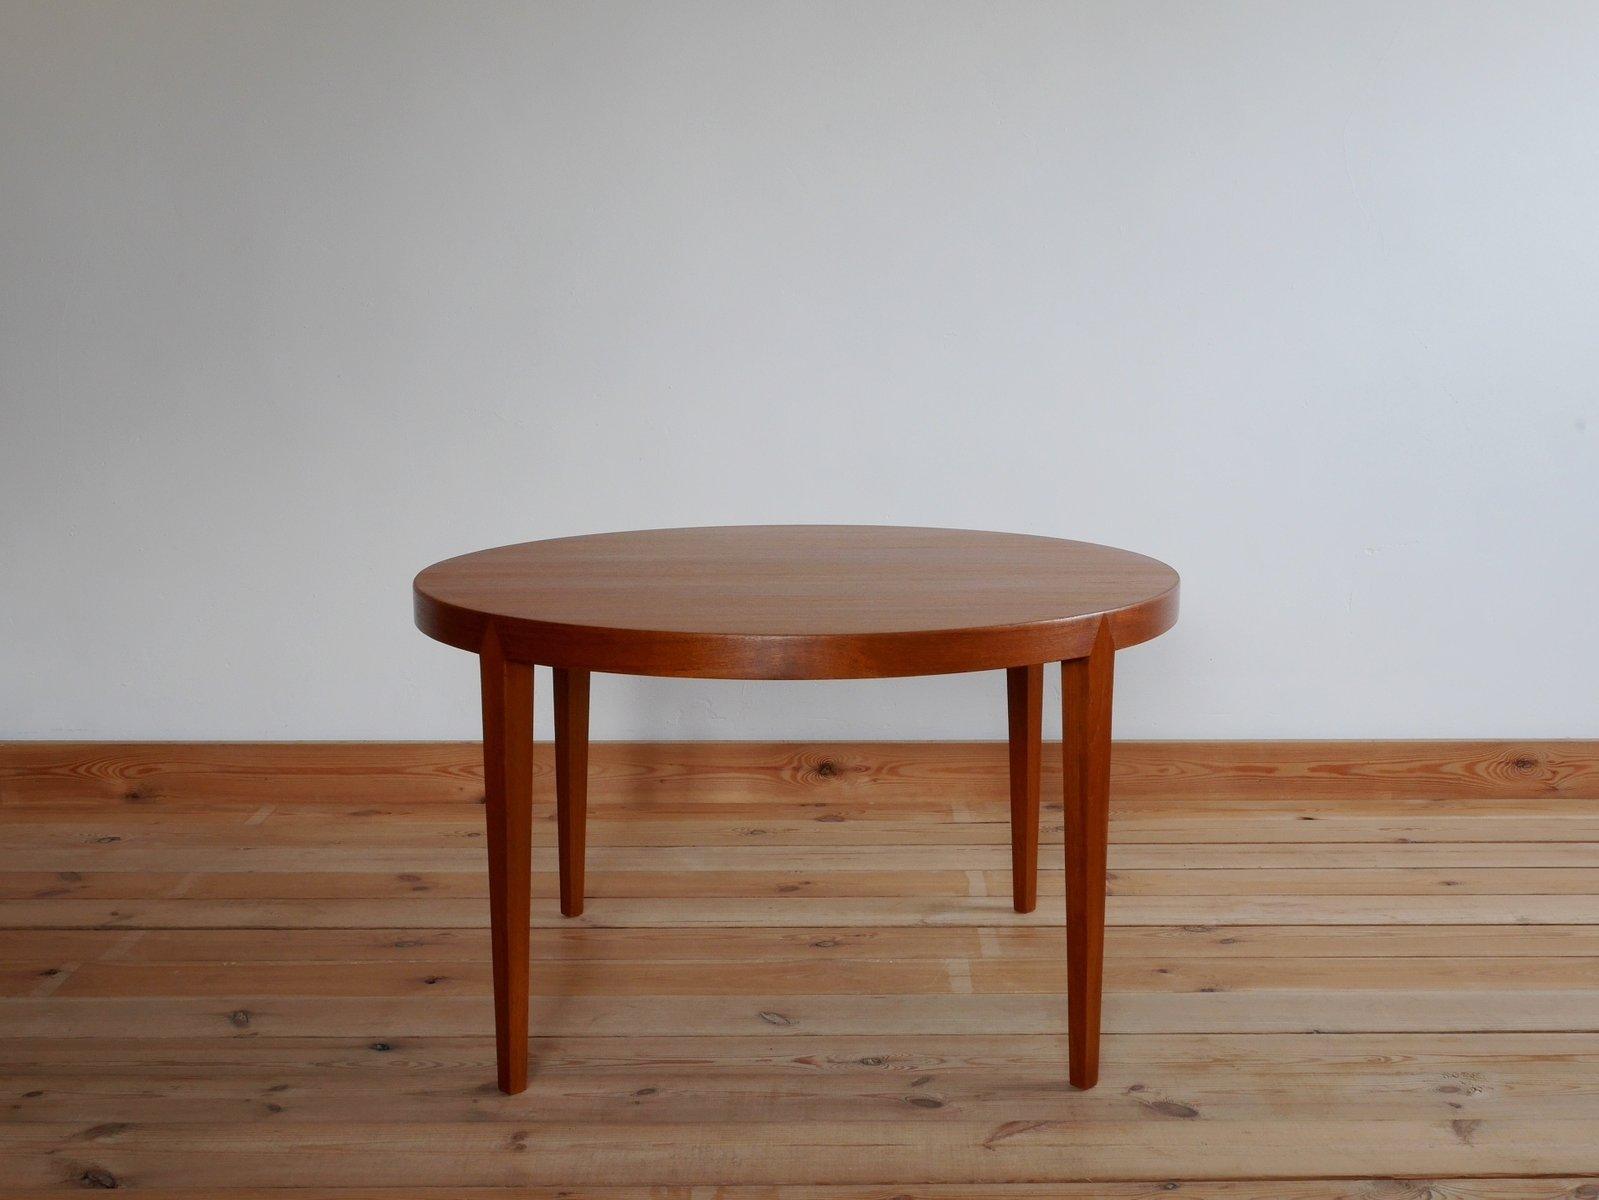 Danish teak round coffee table by severin hansen for haslev 1960s danish teak round coffee table by severin hansen for haslev 1960s geotapseo Choice Image